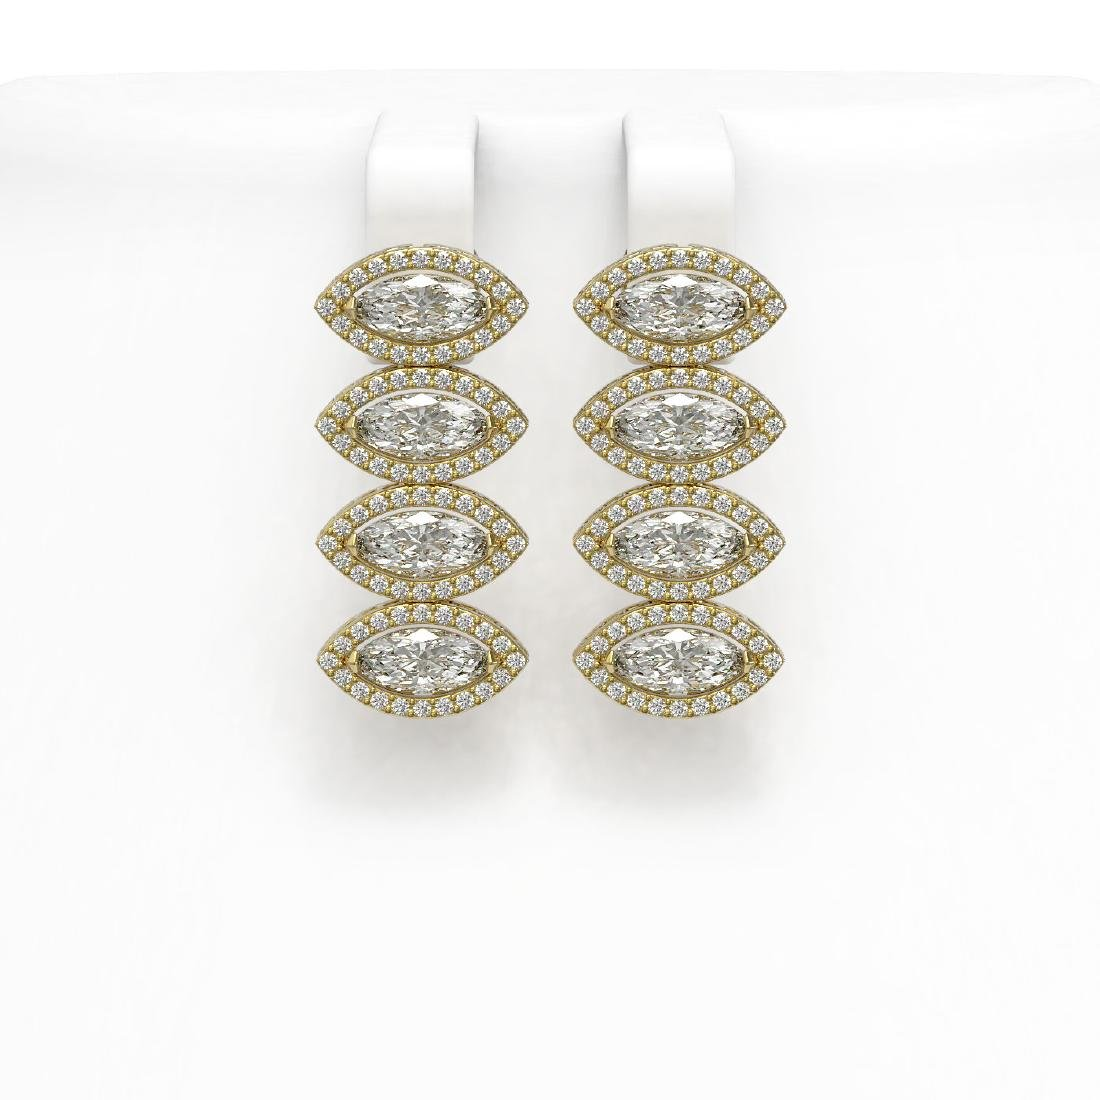 5.92 CTW Marquise Diamond Designer Earrings 18K Yellow